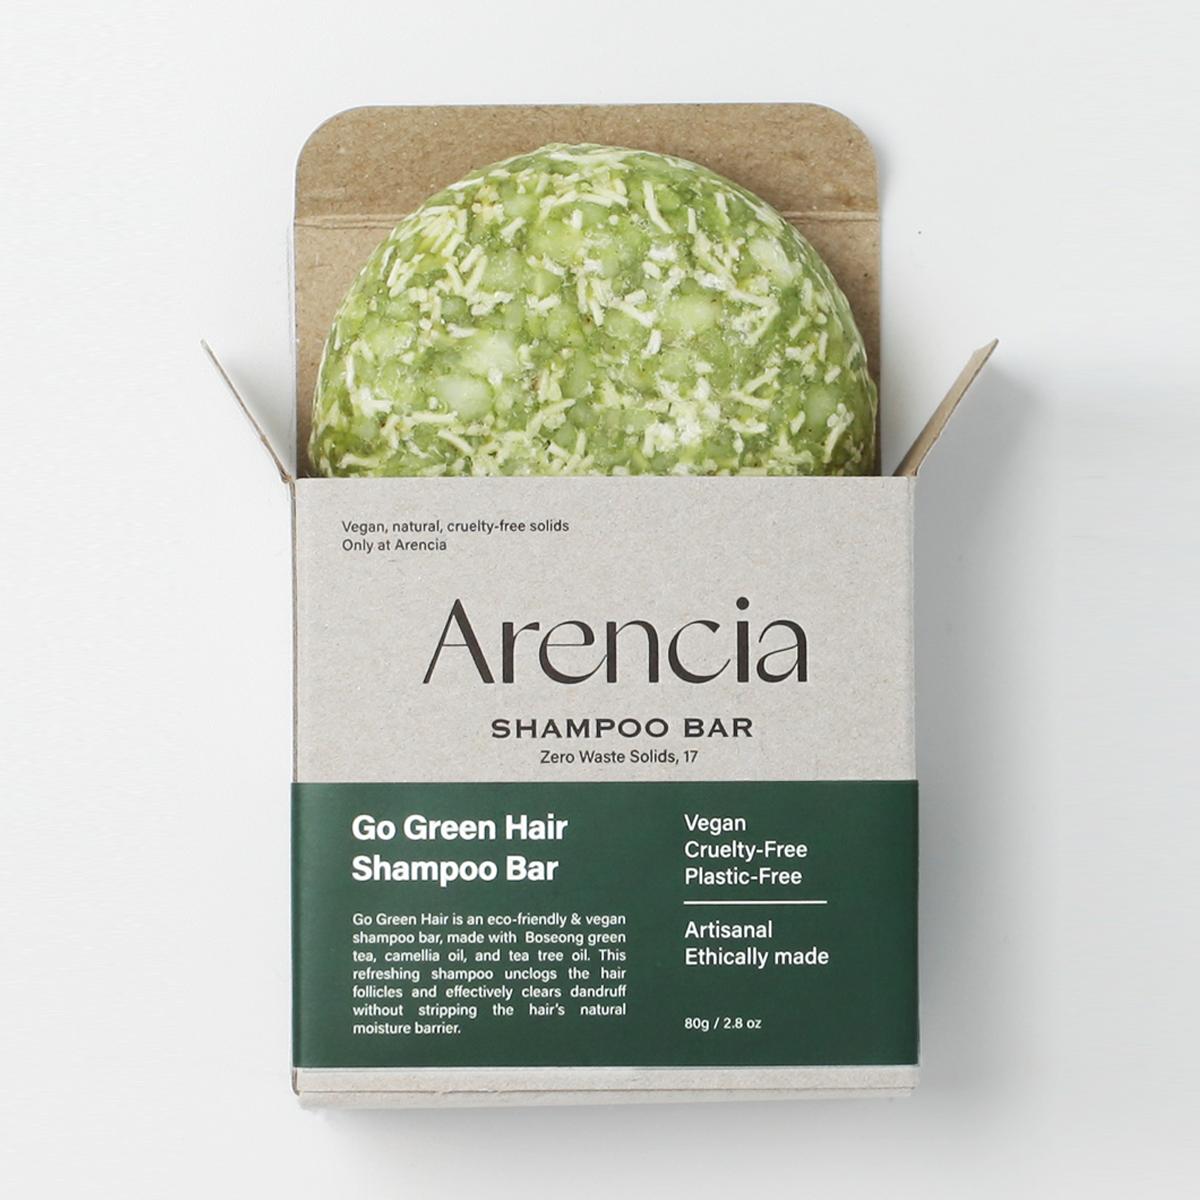 Arencia Shampoo Bar